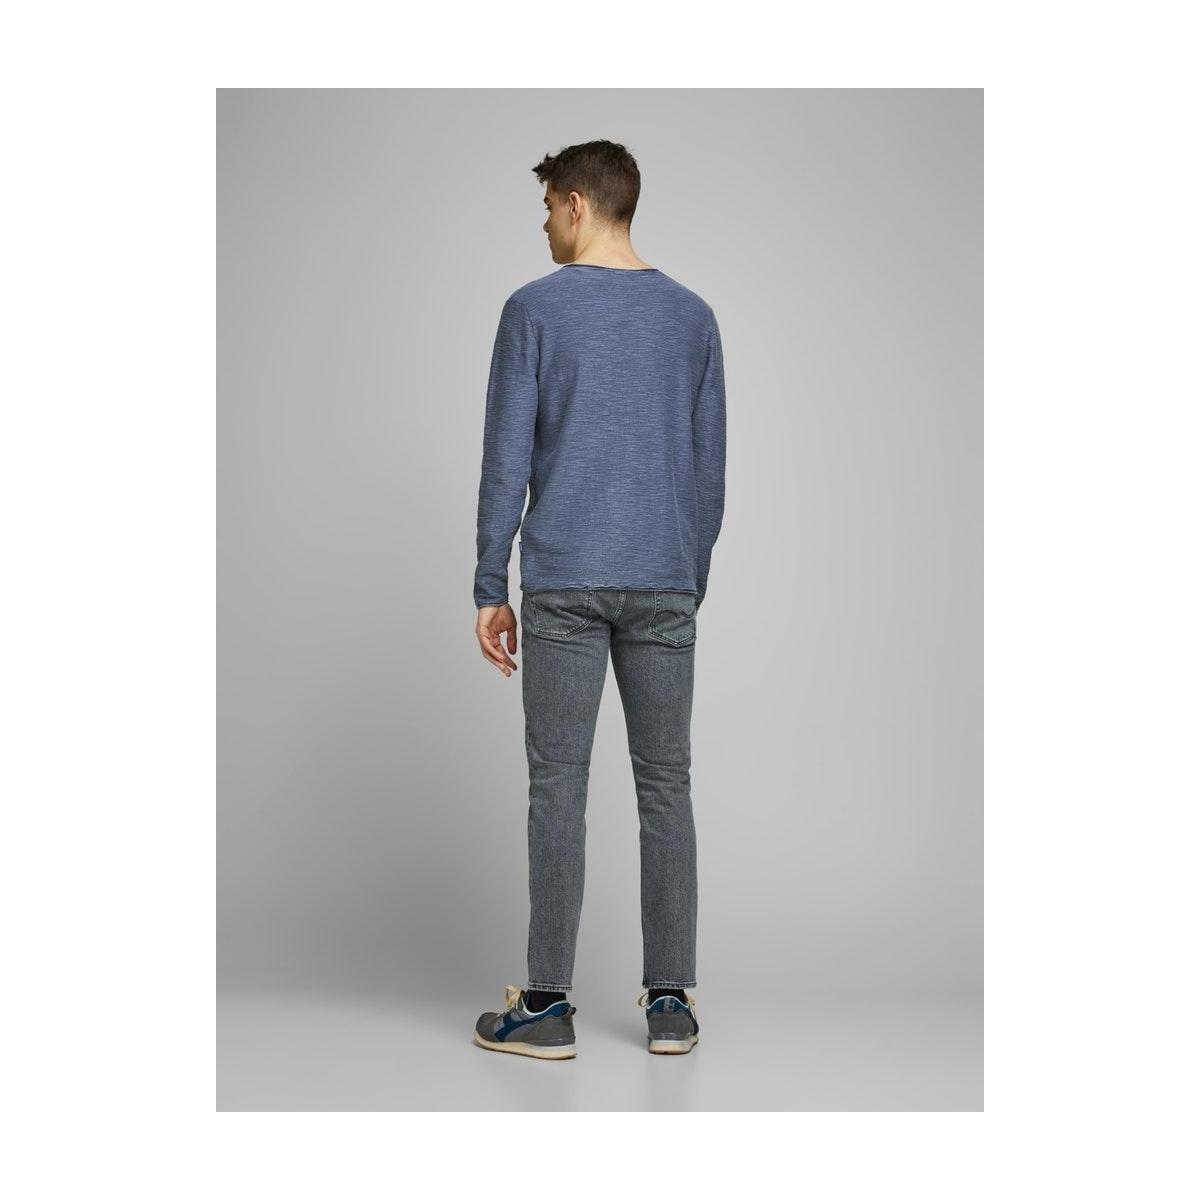 jorniels organic knit crew neck 12170772 jack & jones trui ensign blue/knit fit